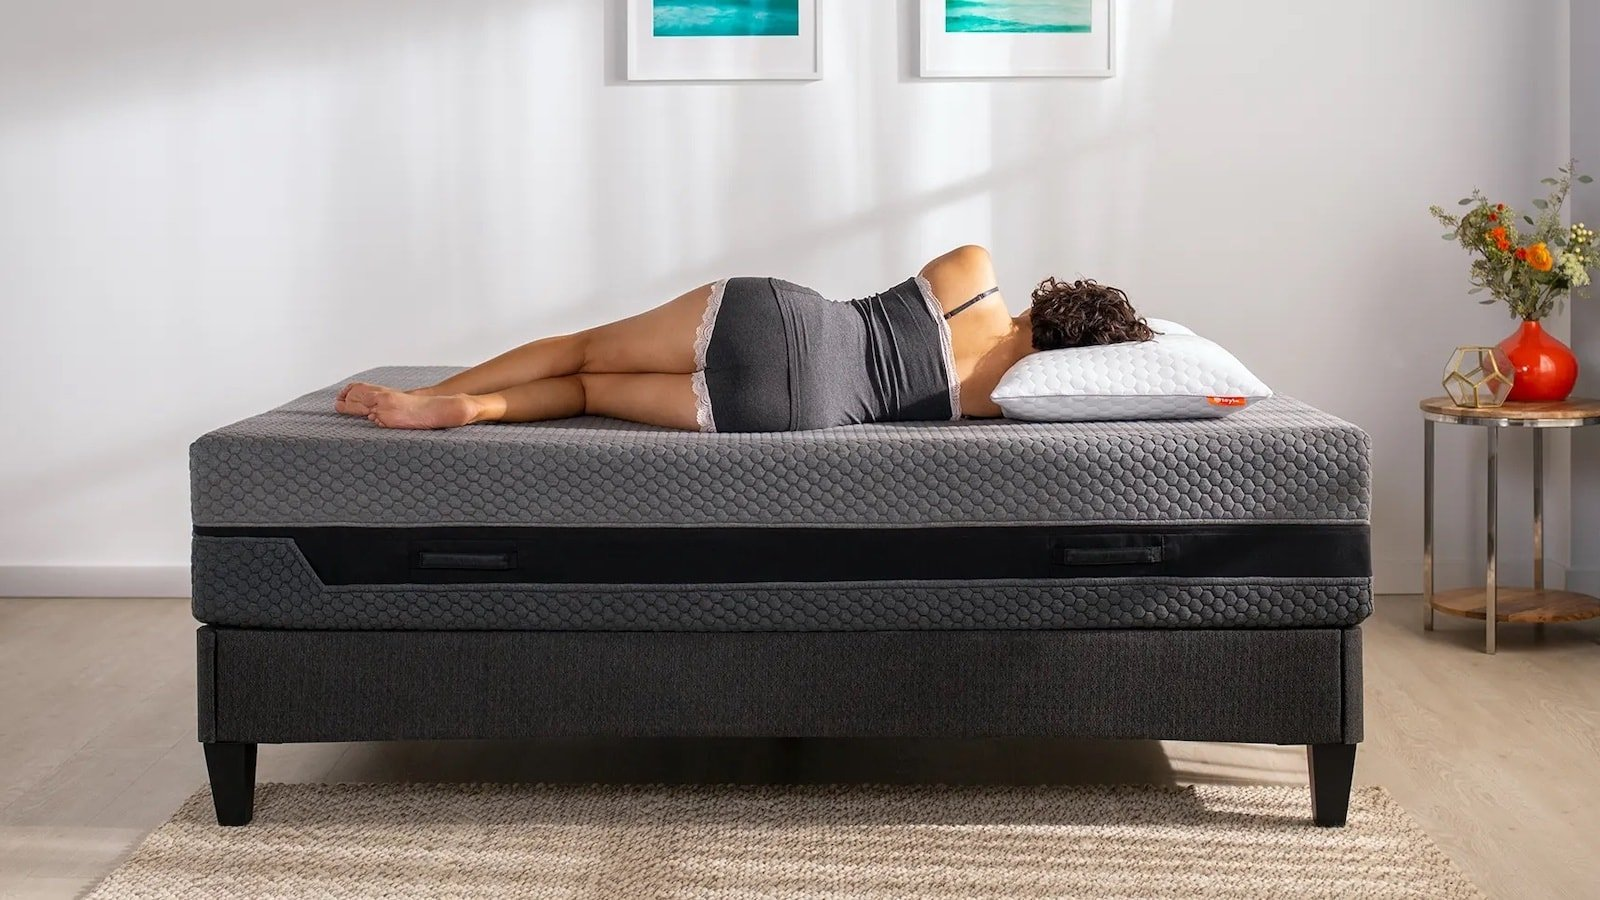 Layla Sleep Hybrid Mattress has both memory foam and coil springs